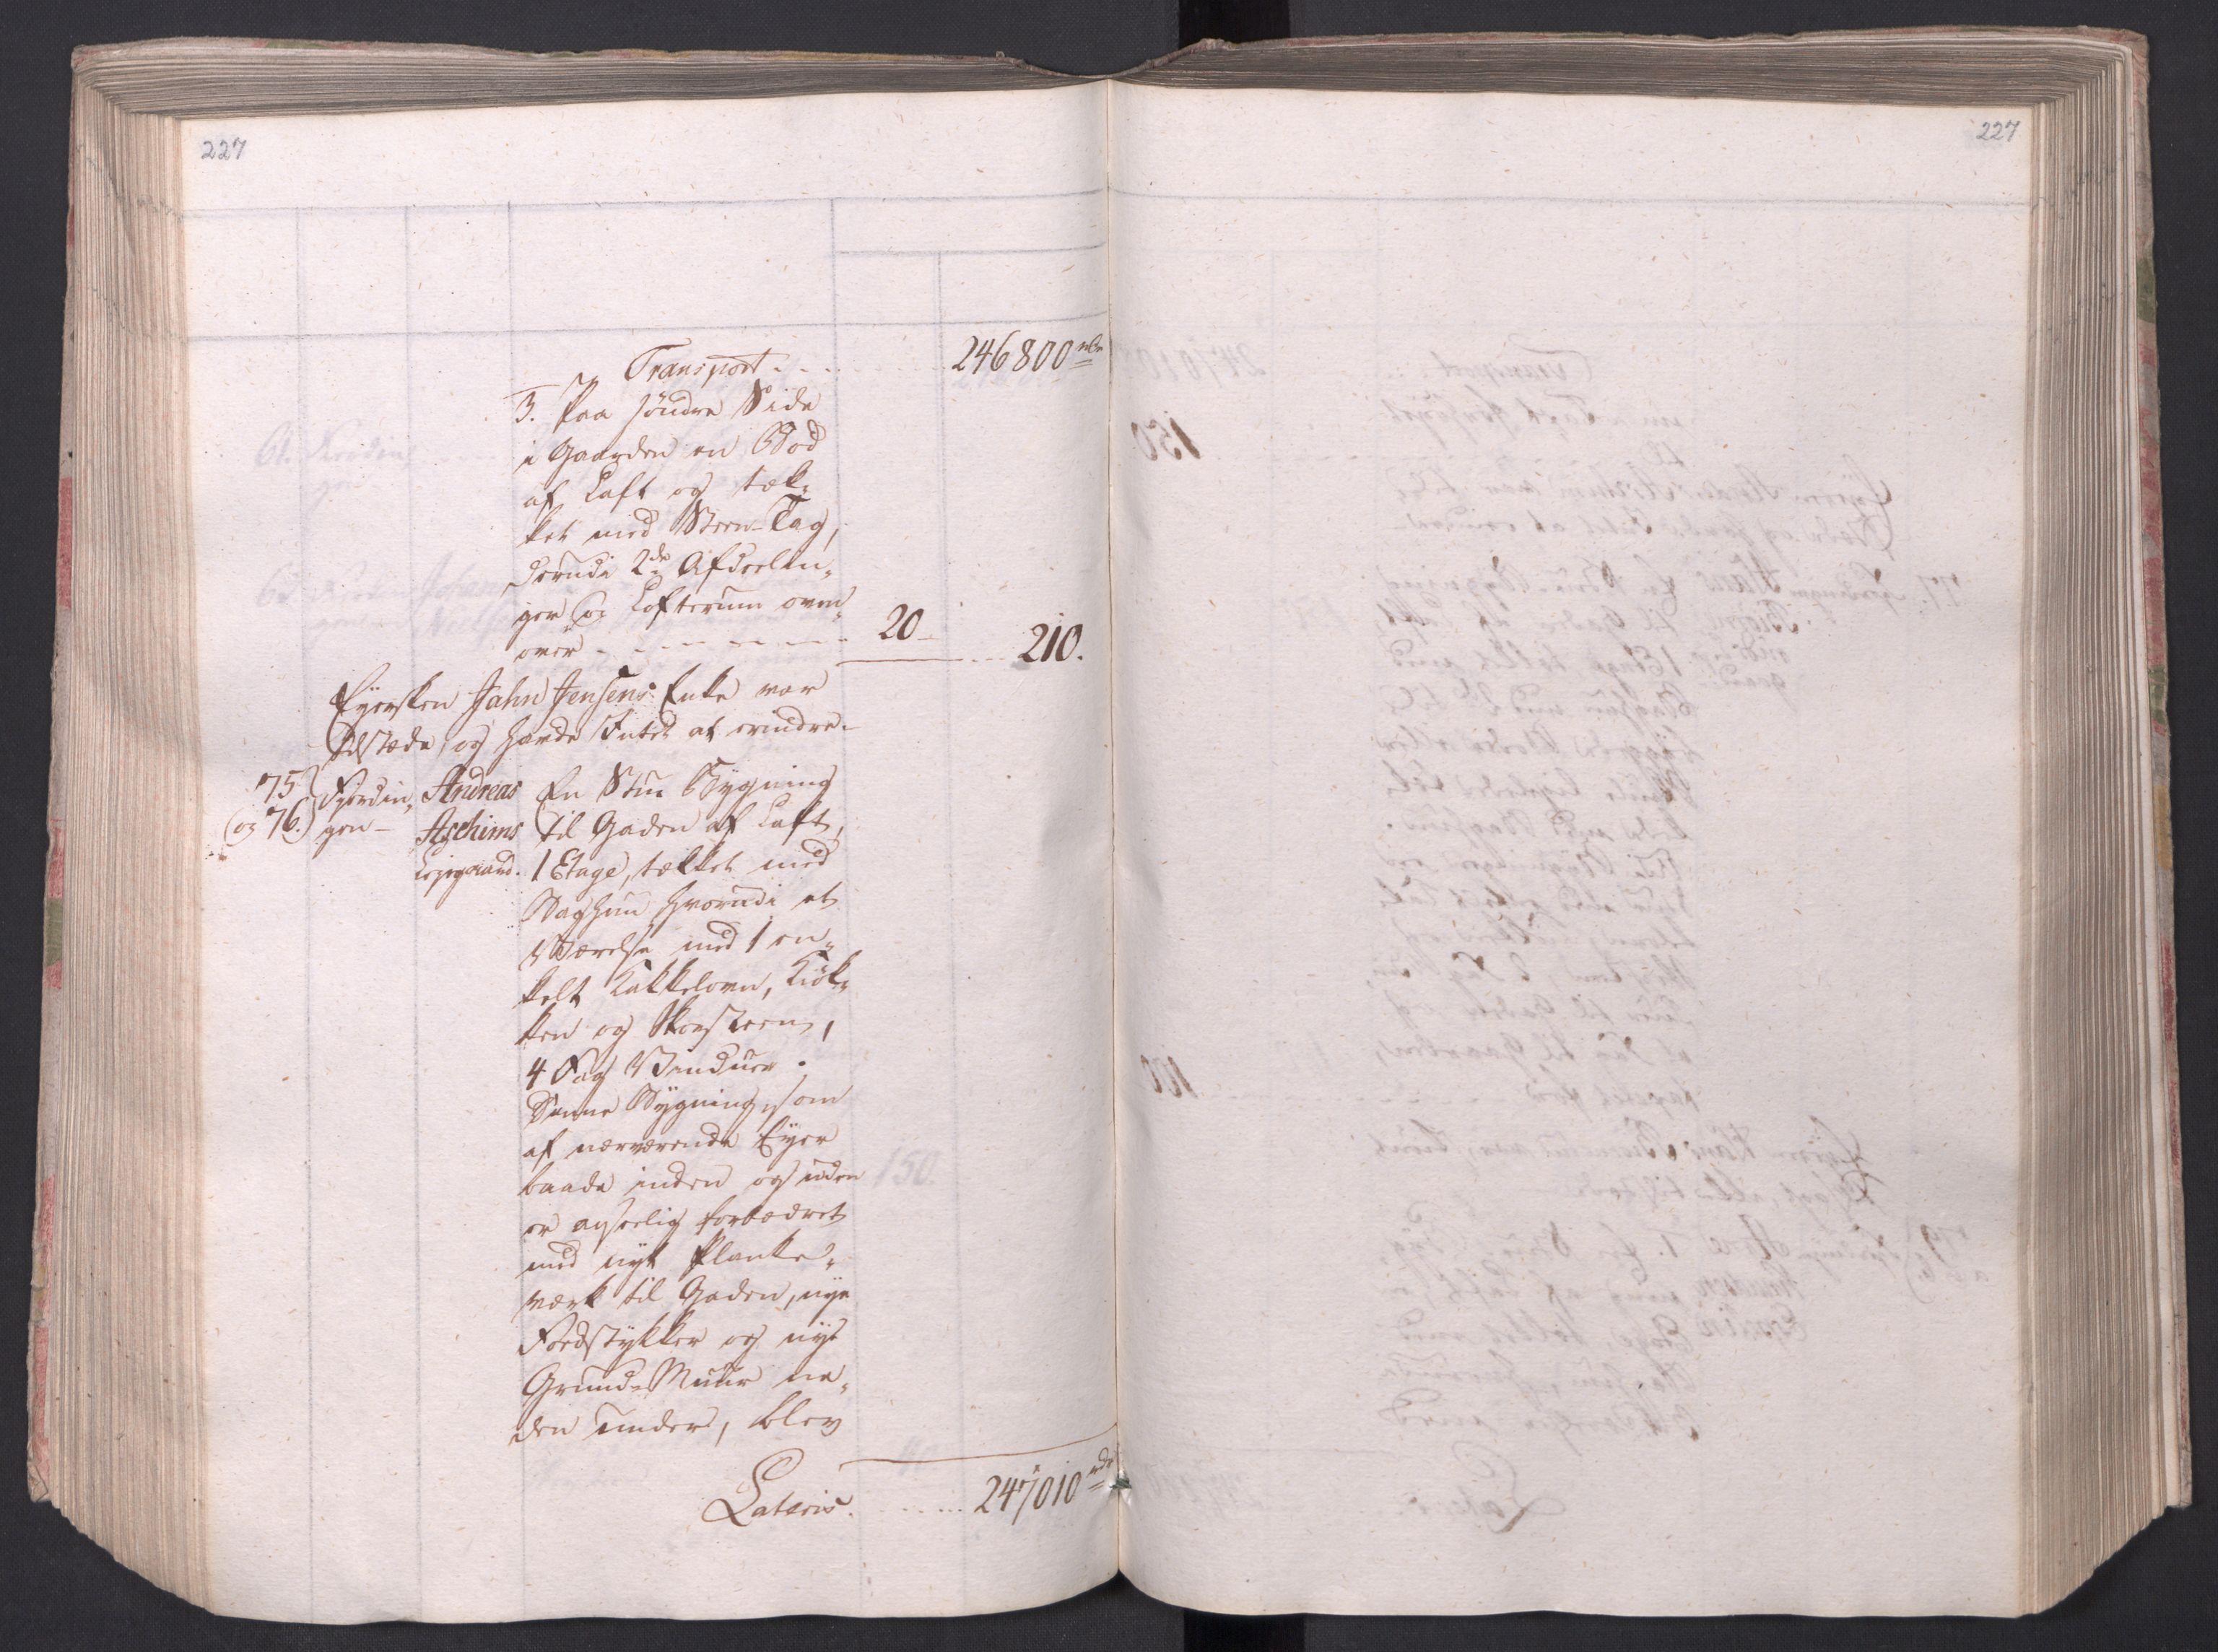 SAO, Kristiania stiftamt, I/Ia/L0015: Branntakster, 1797, s. 227